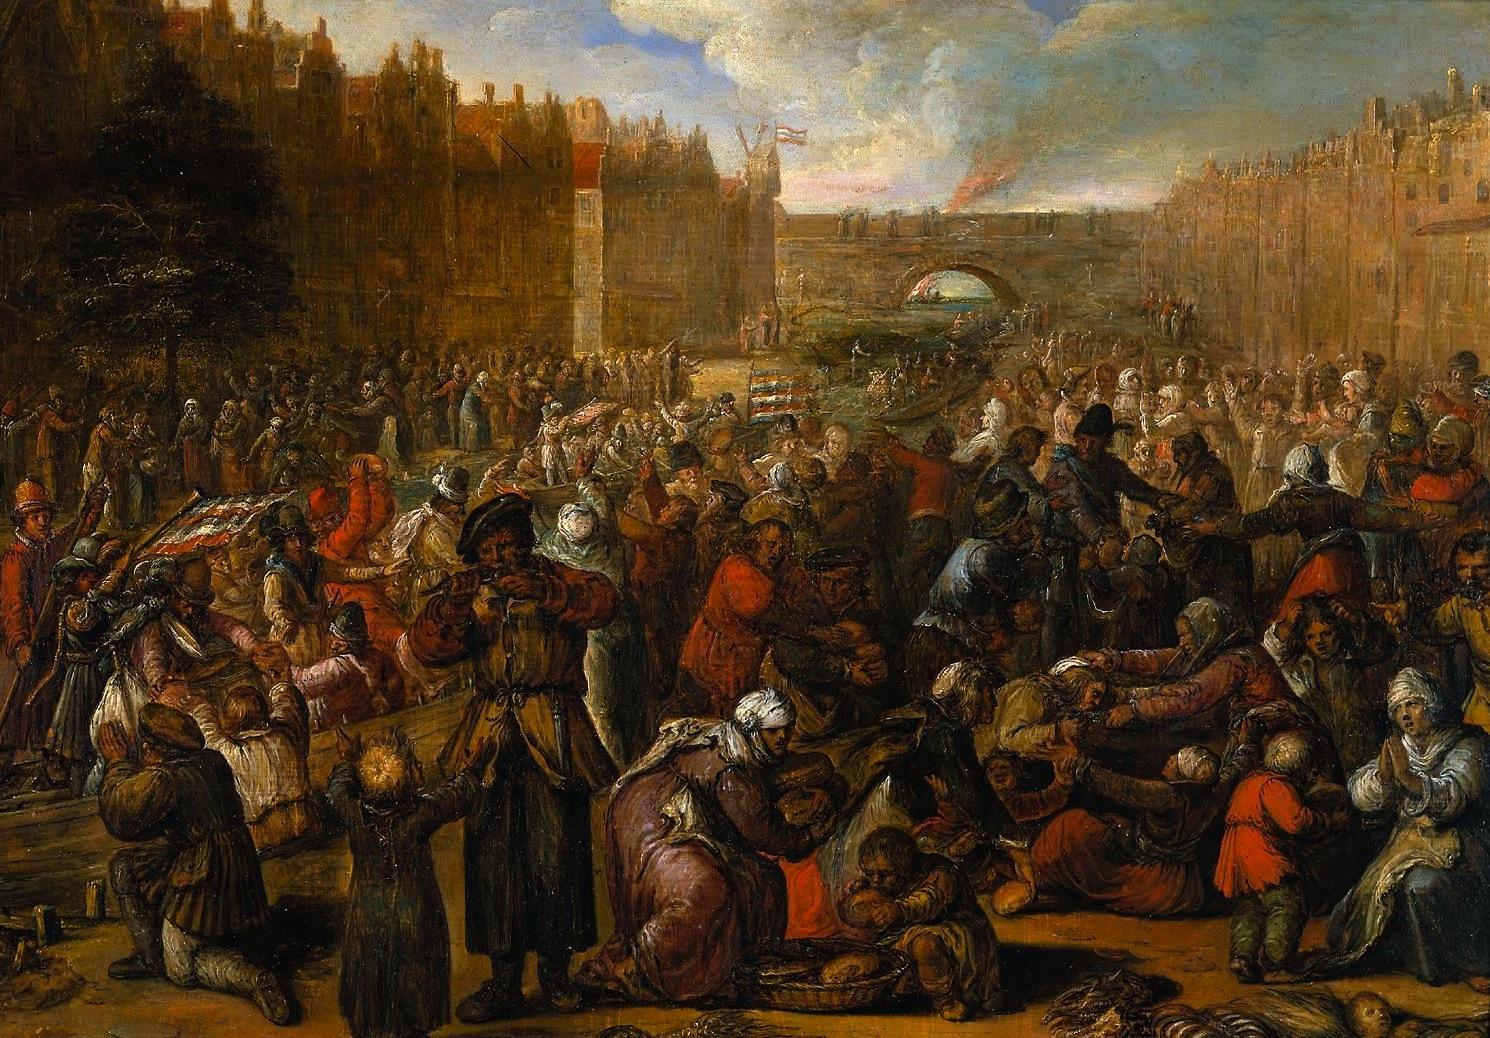 The English bourgeois revolution